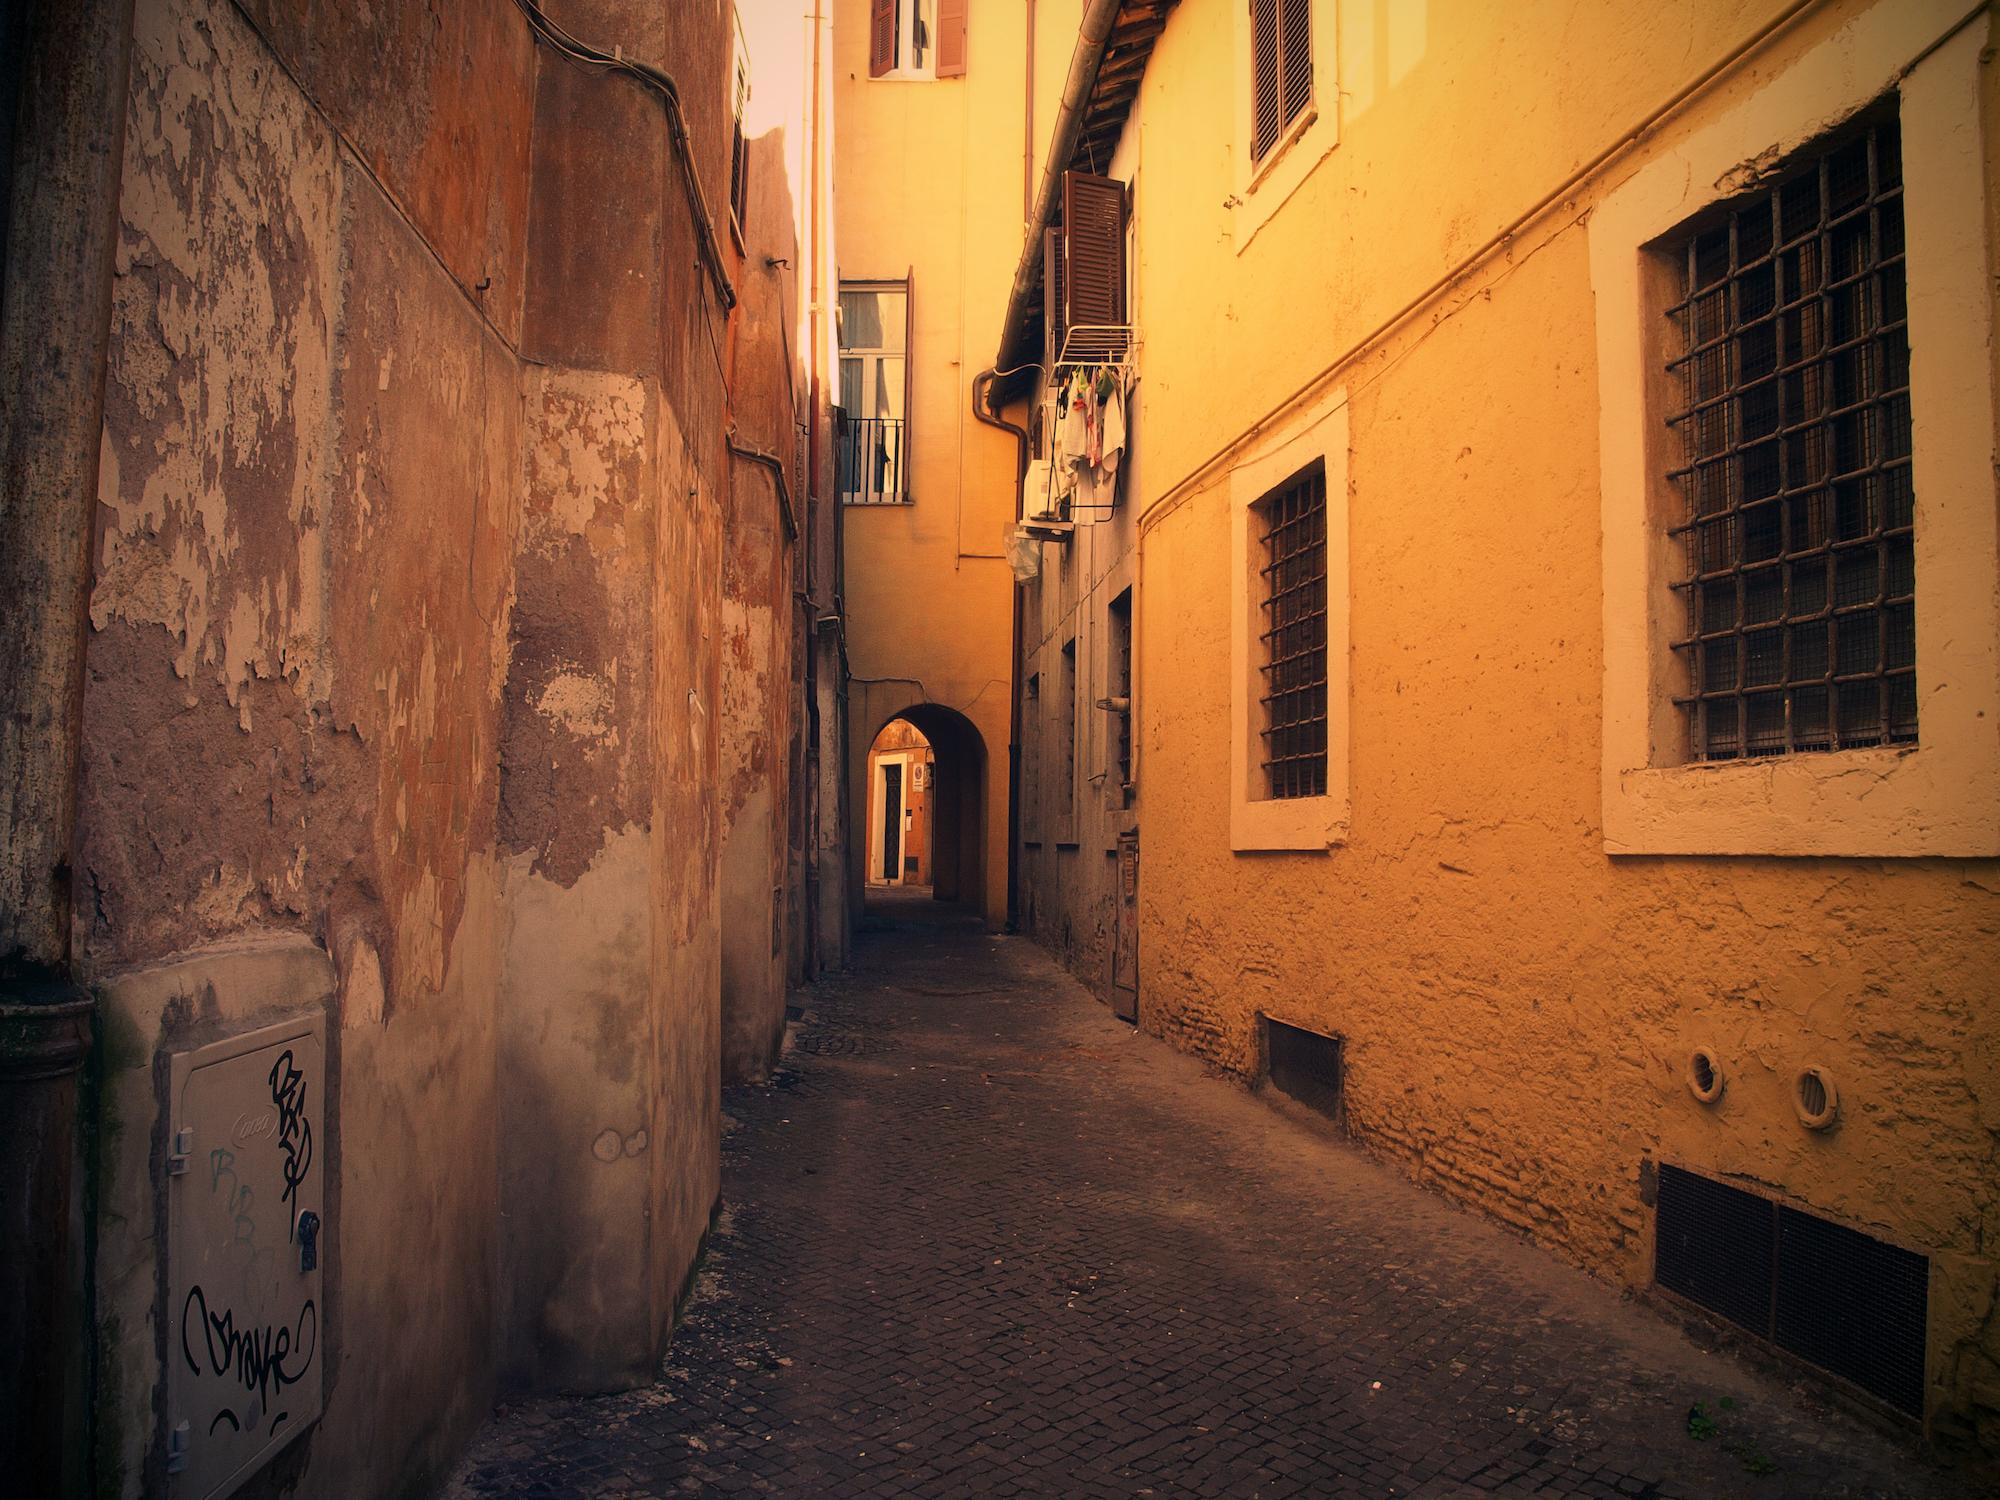 Alley 02  / Part of 'Trip To Italy' series by Geena Matuson @geenamatuson, 2011.